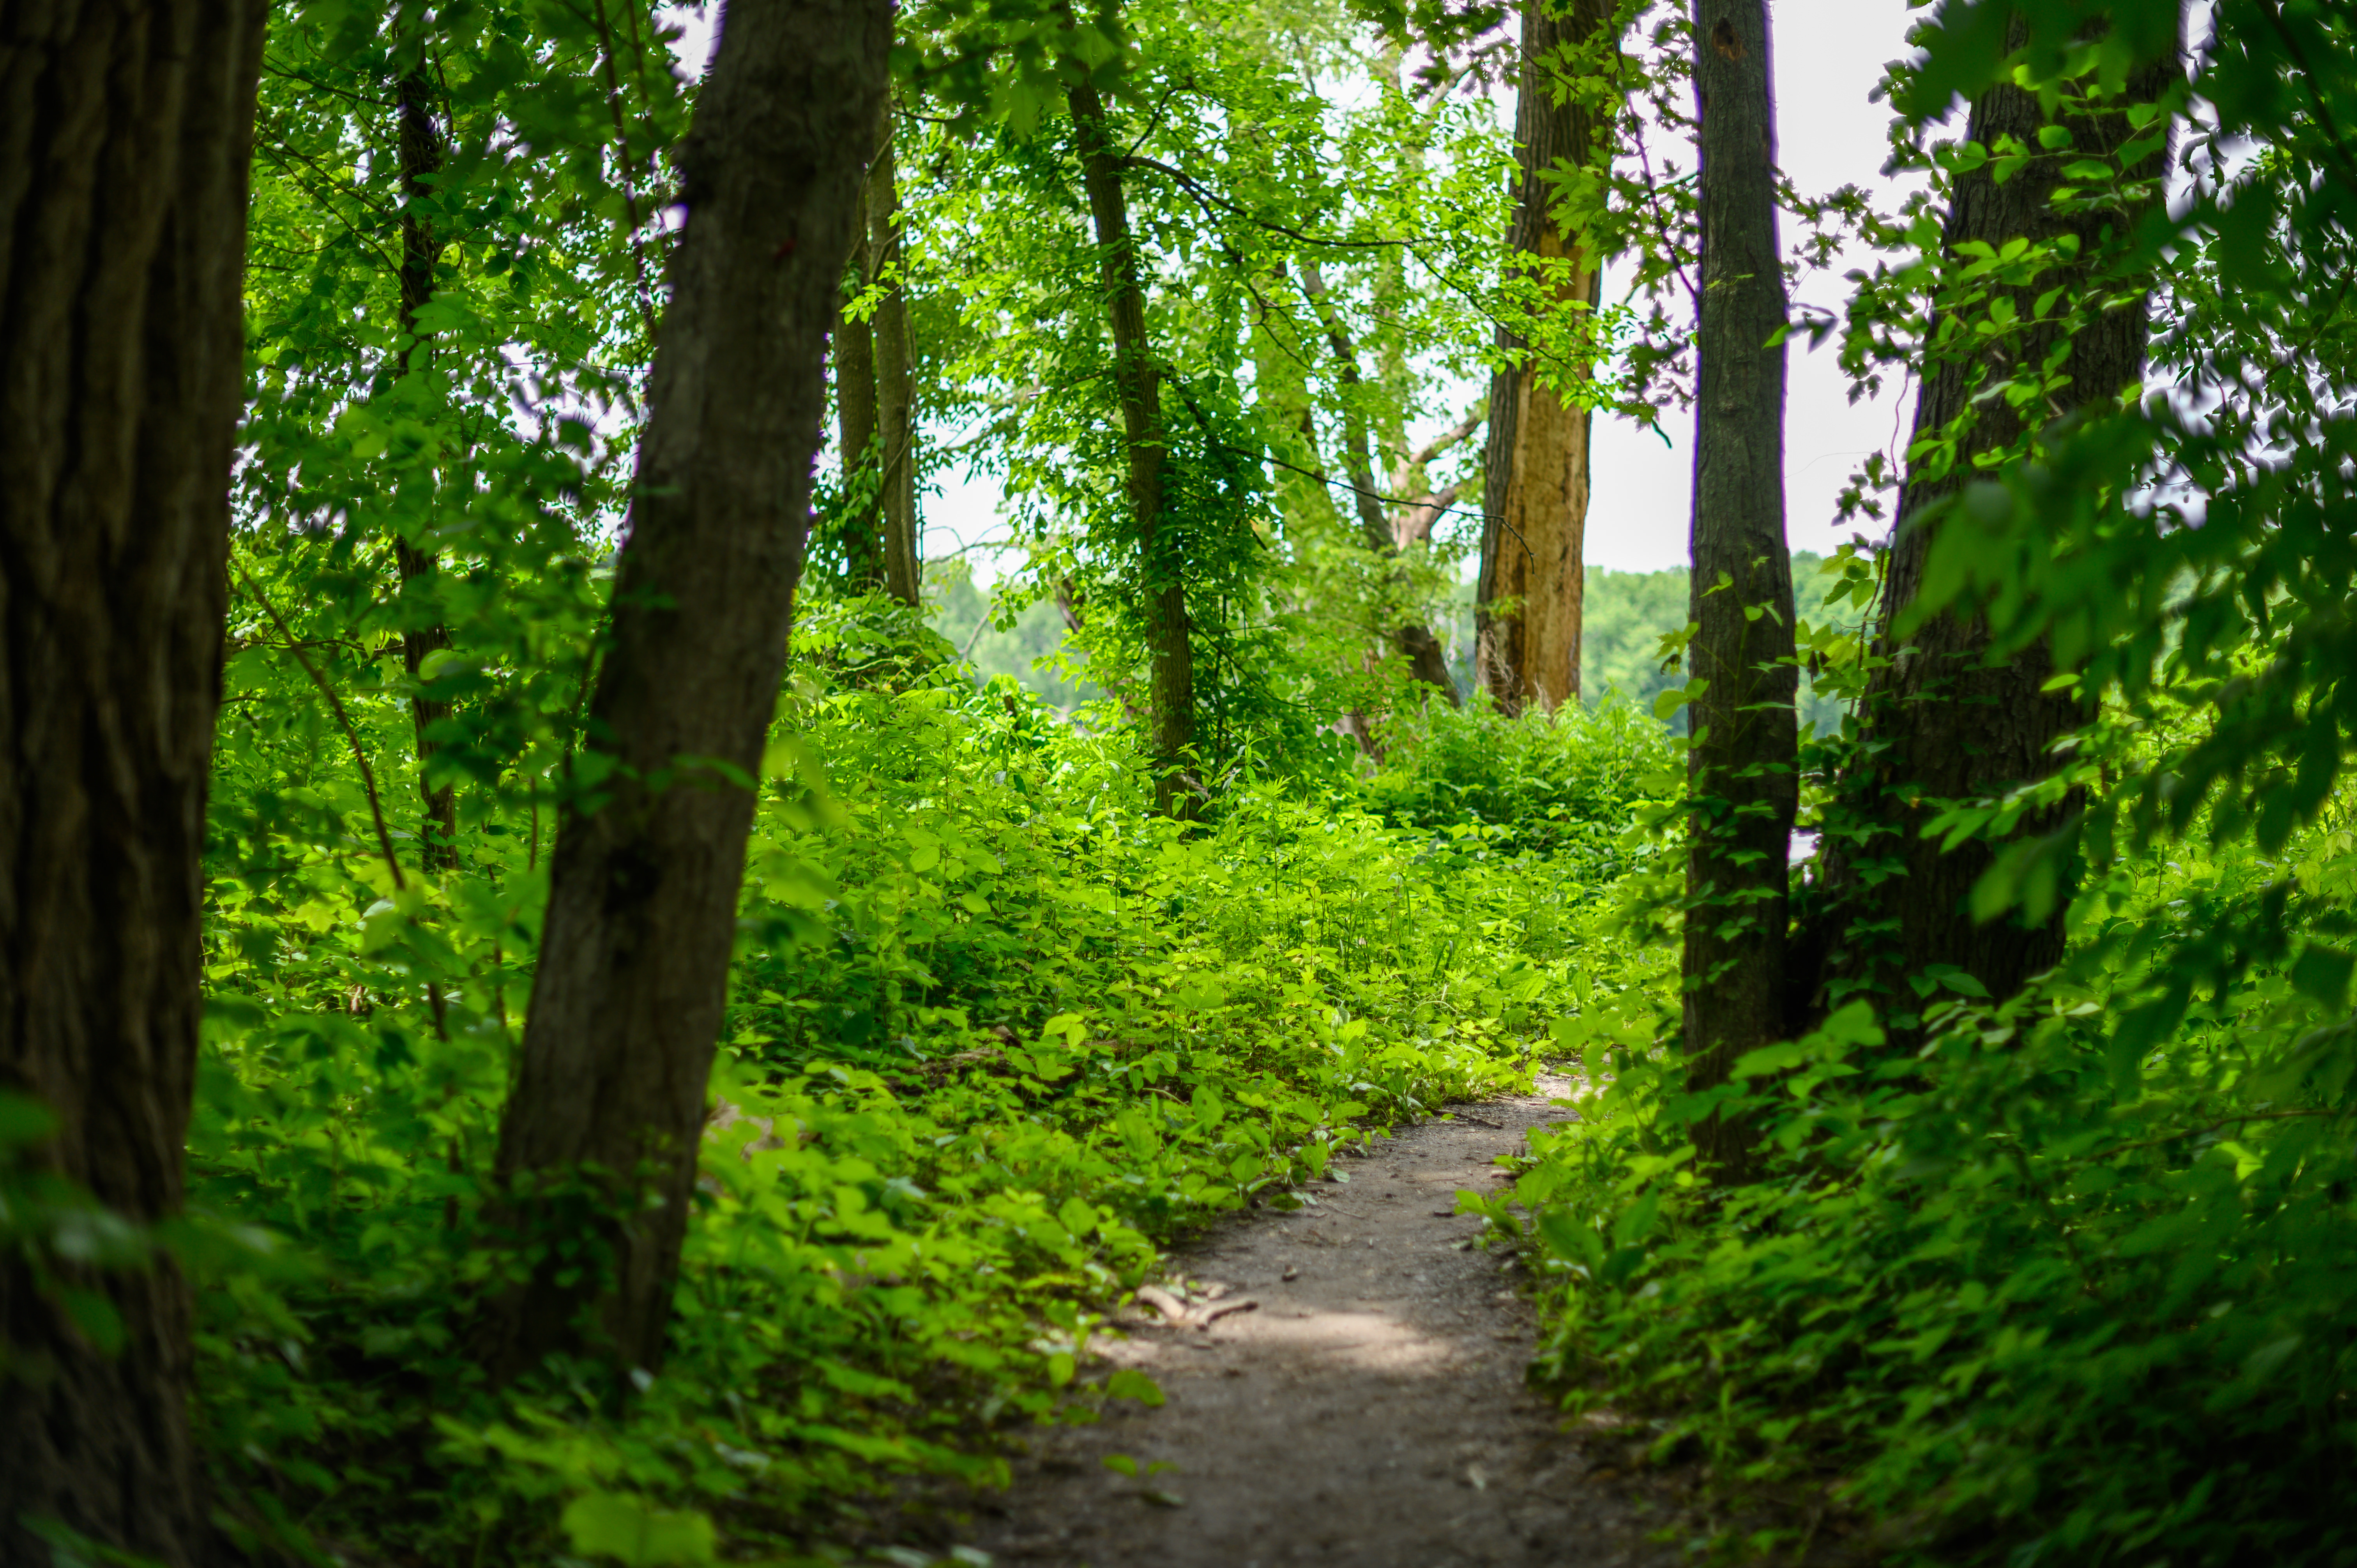 Trail at Papscanee Island Nature Preserve